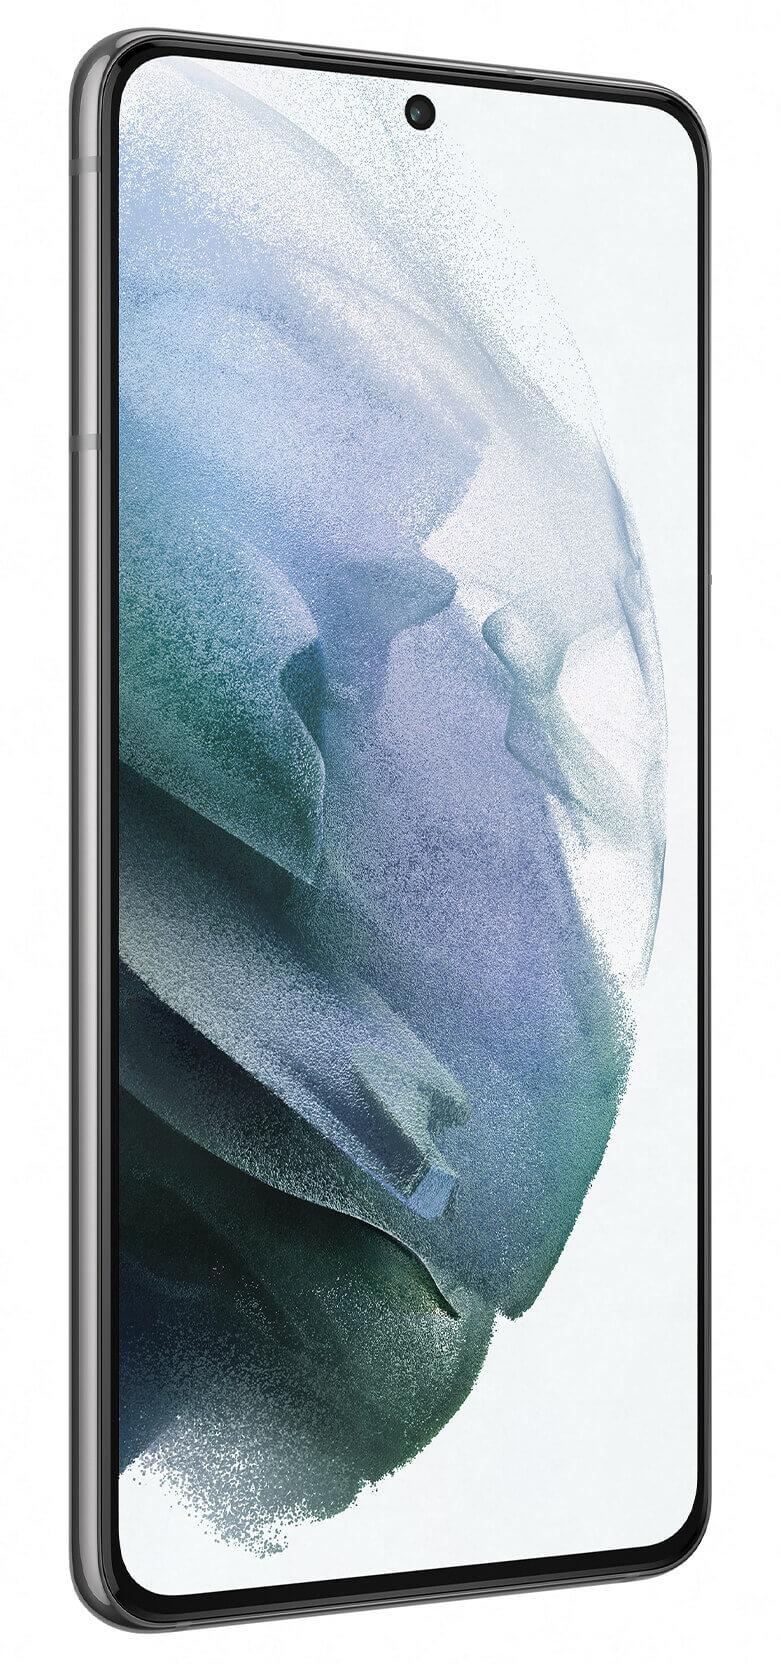 Samsung Galaxy S21 Plus 5G Phantom Black 8GB RAM 128GB